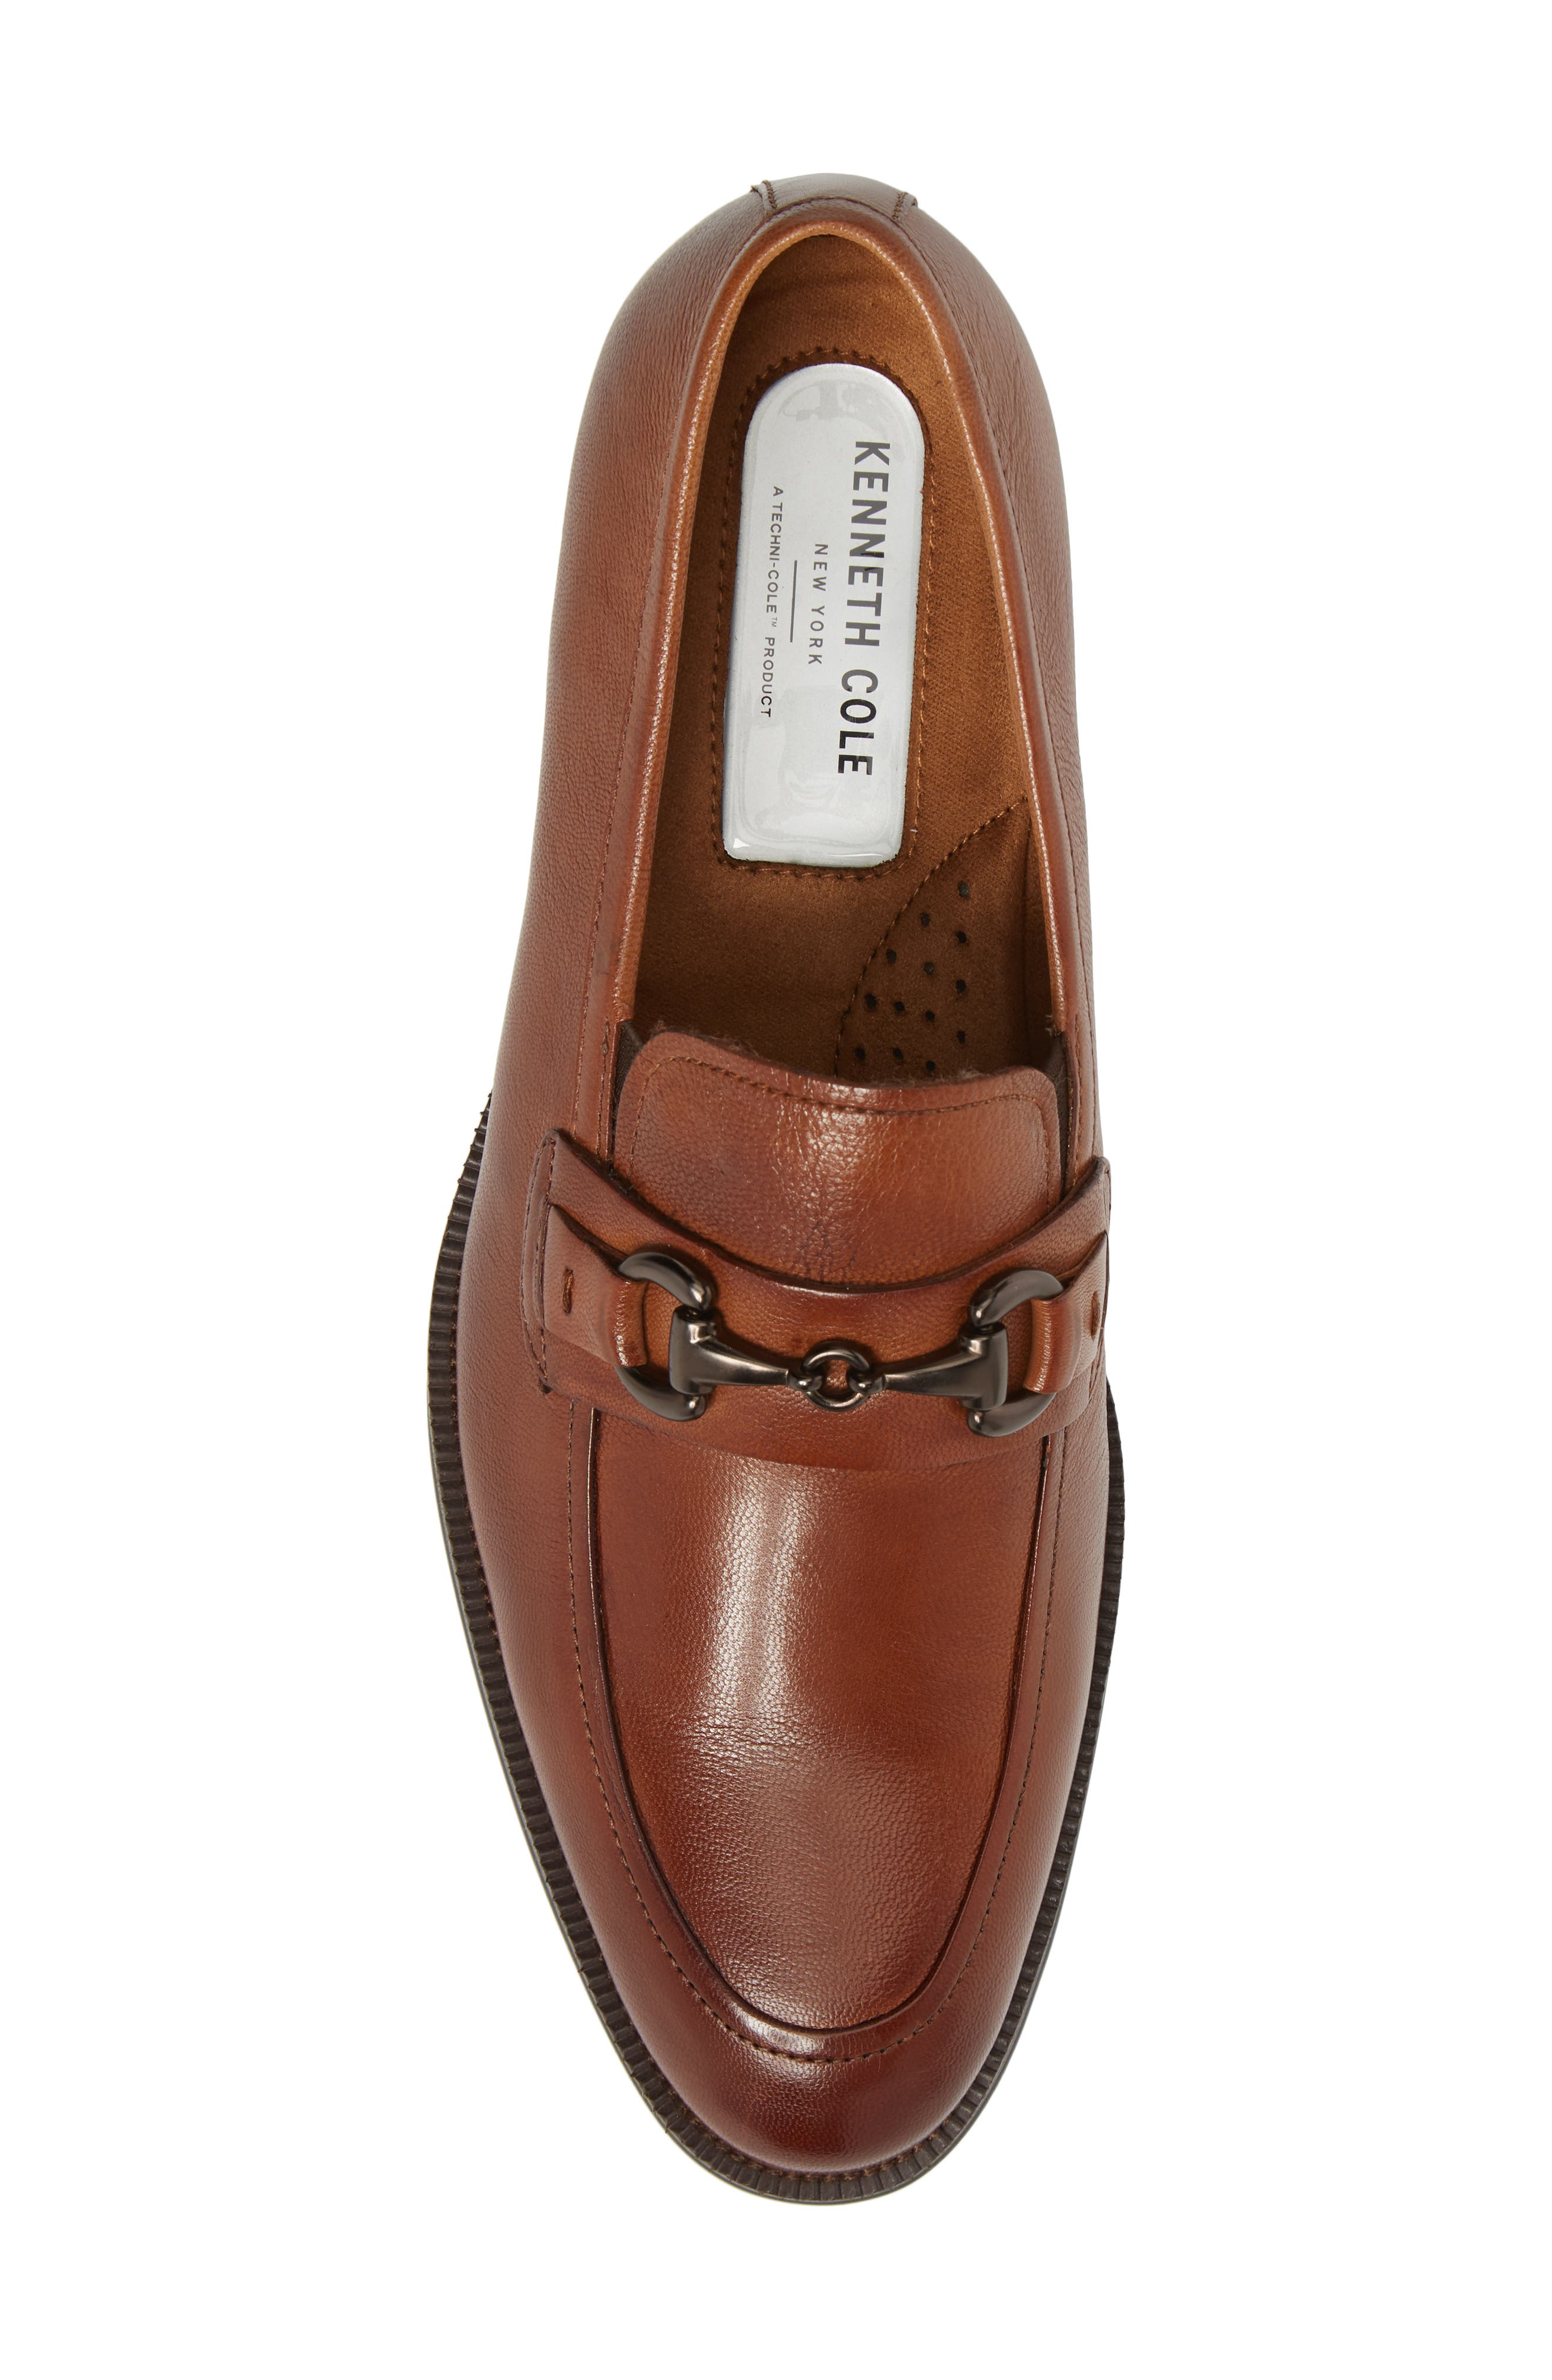 Brock Bit Loafer,                             Alternate thumbnail 5, color,                             Cognac Leather